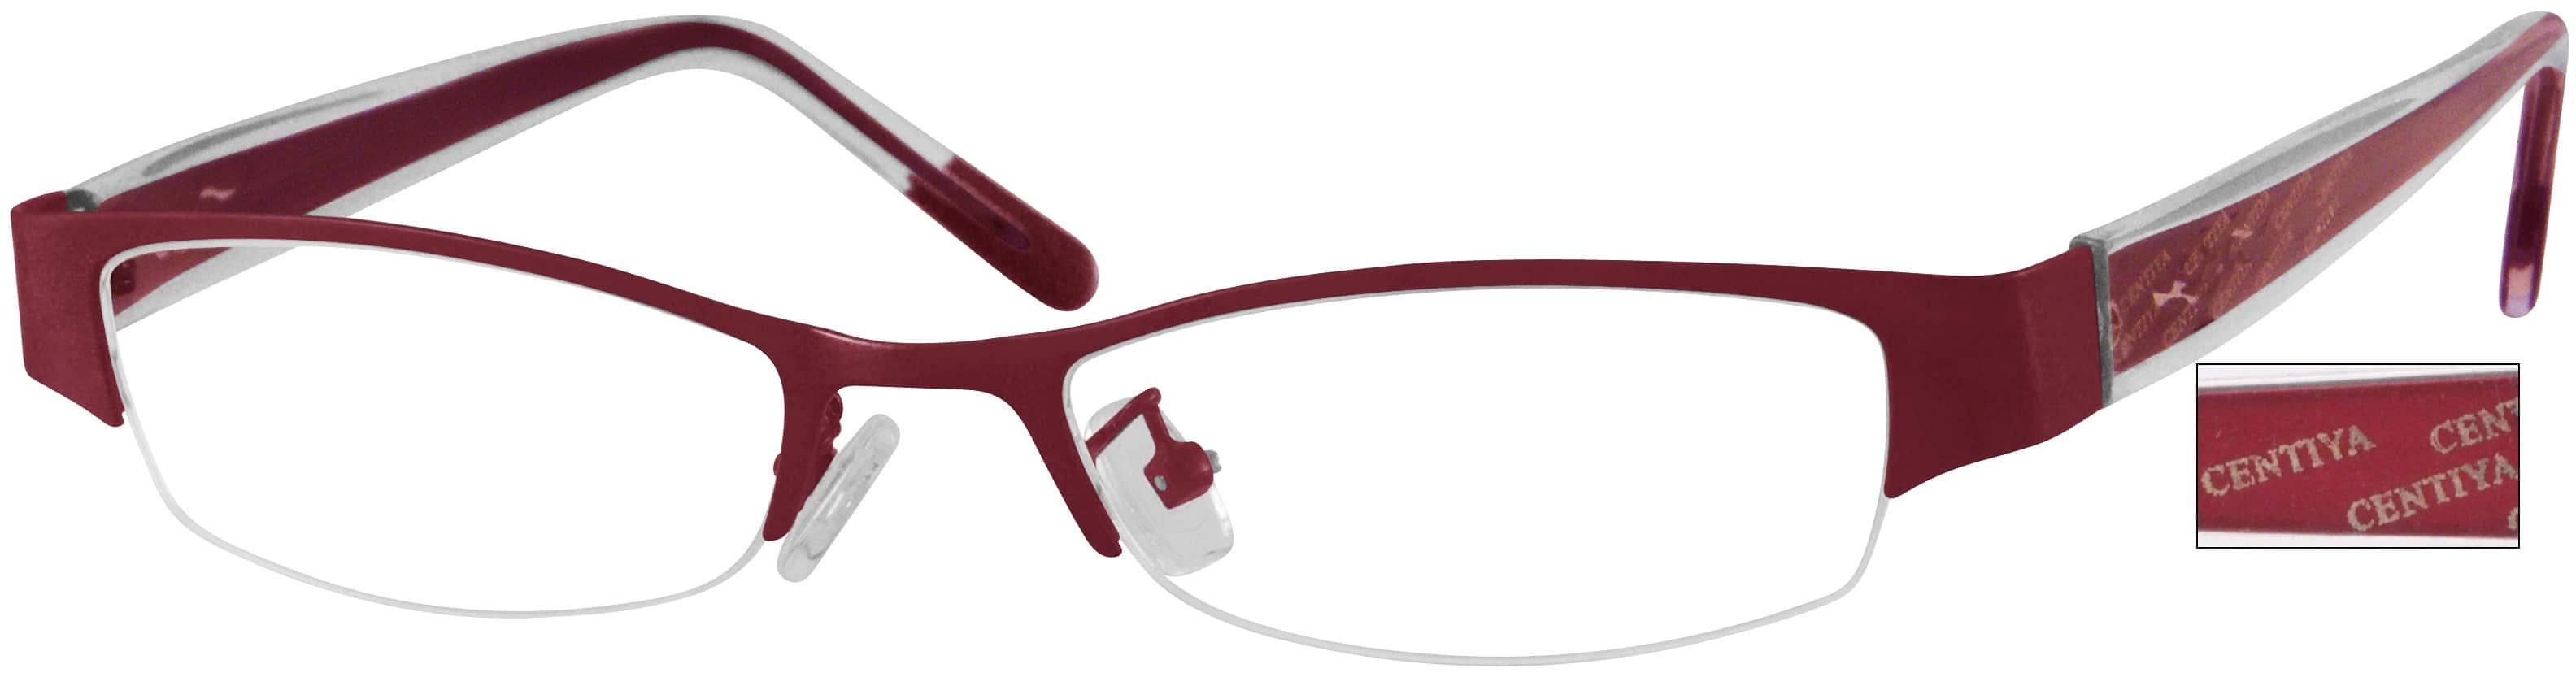 WomenHalf RimMixed MaterialsEyeglasses #397116